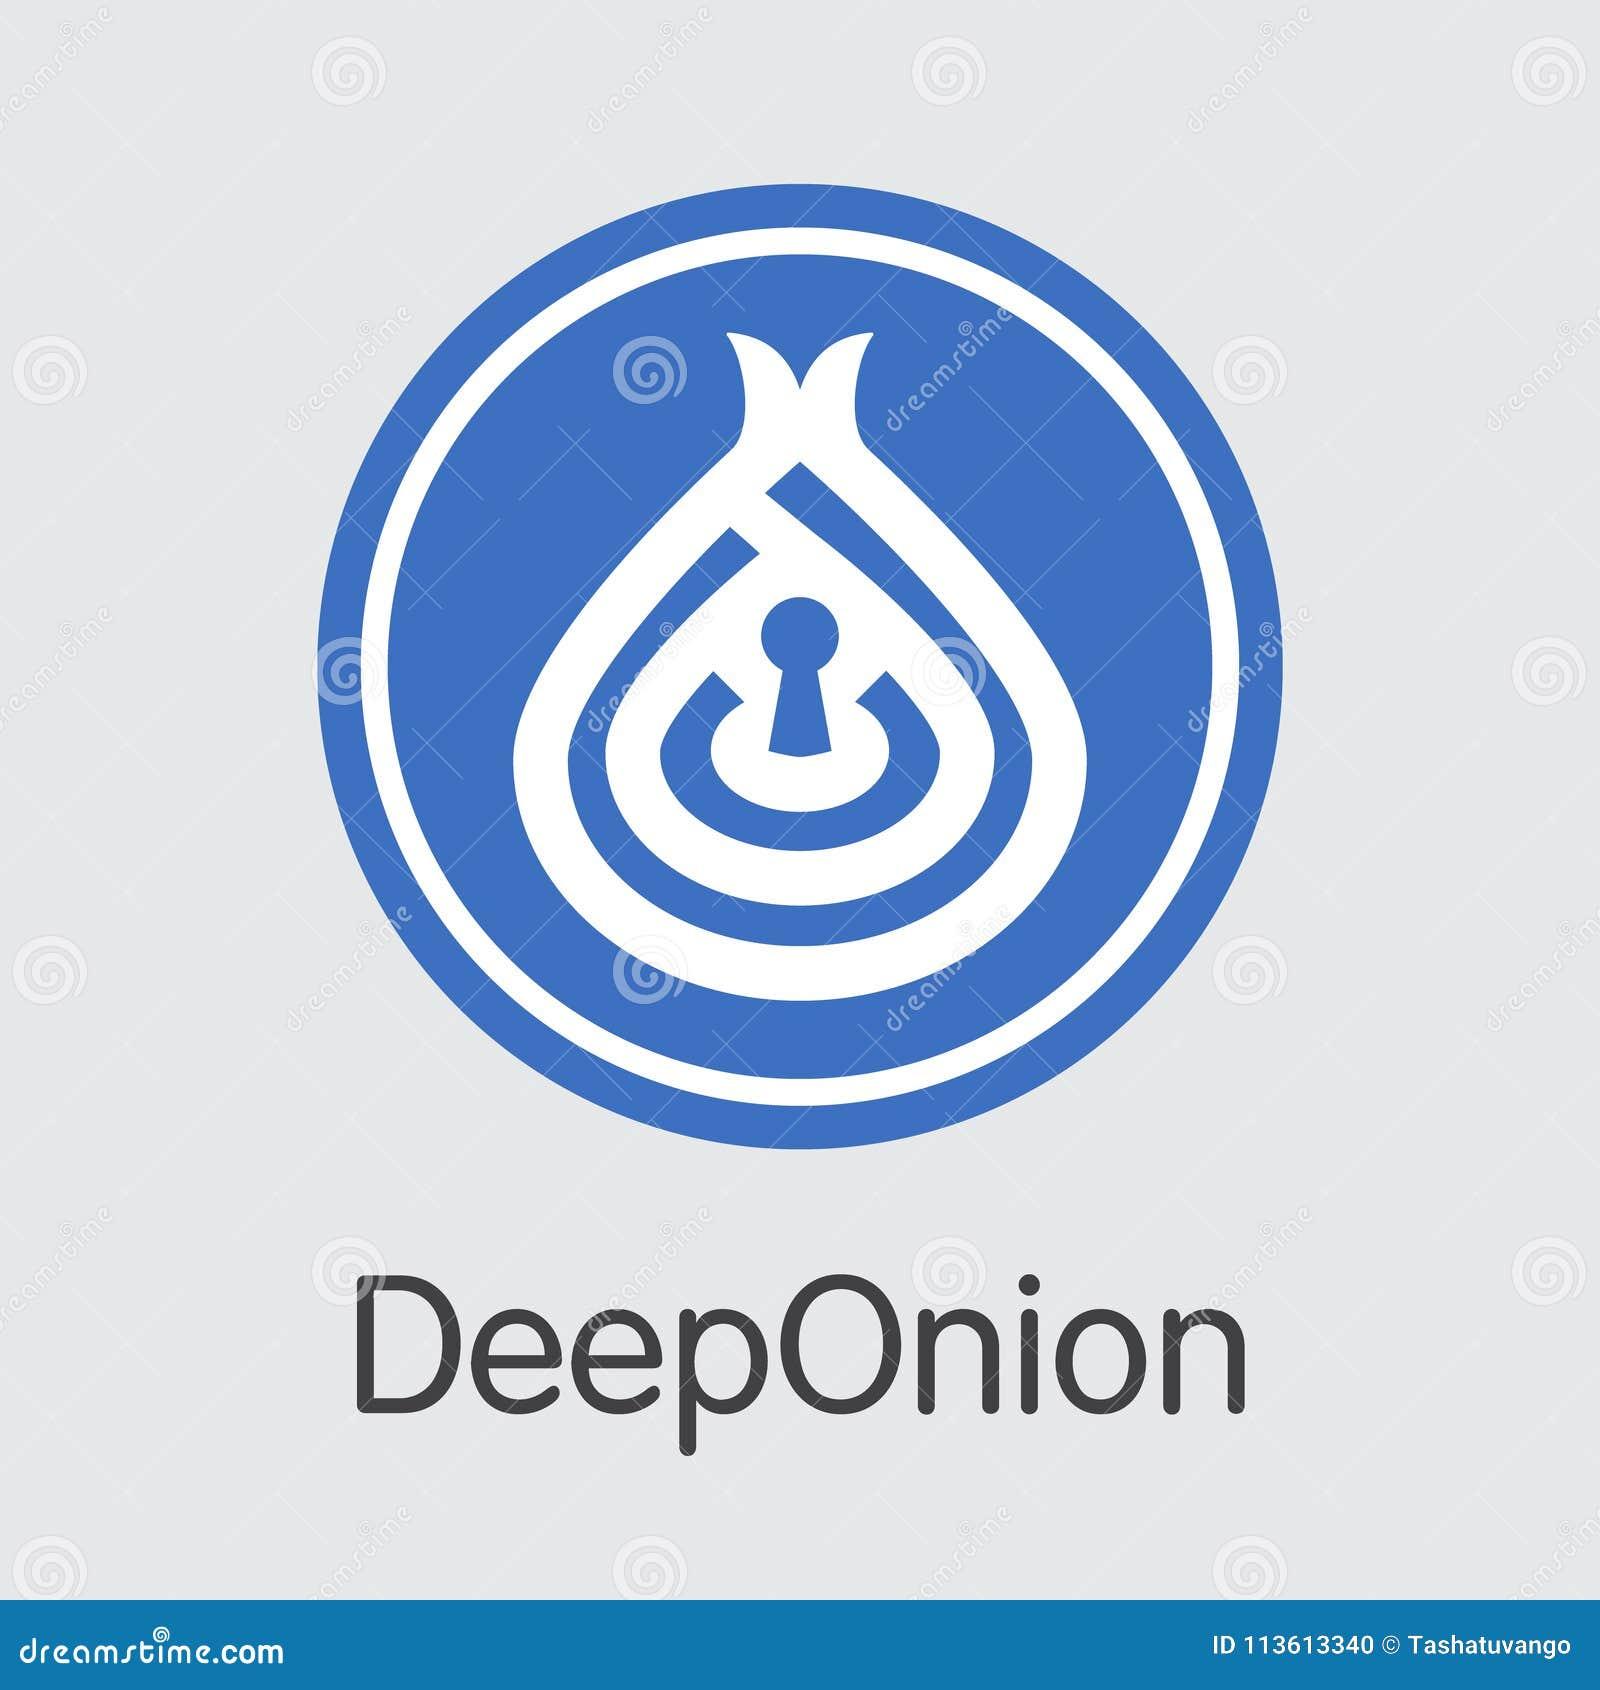 Deeponion Crypto Currency Vector Pictogram Symbol Stock Vector